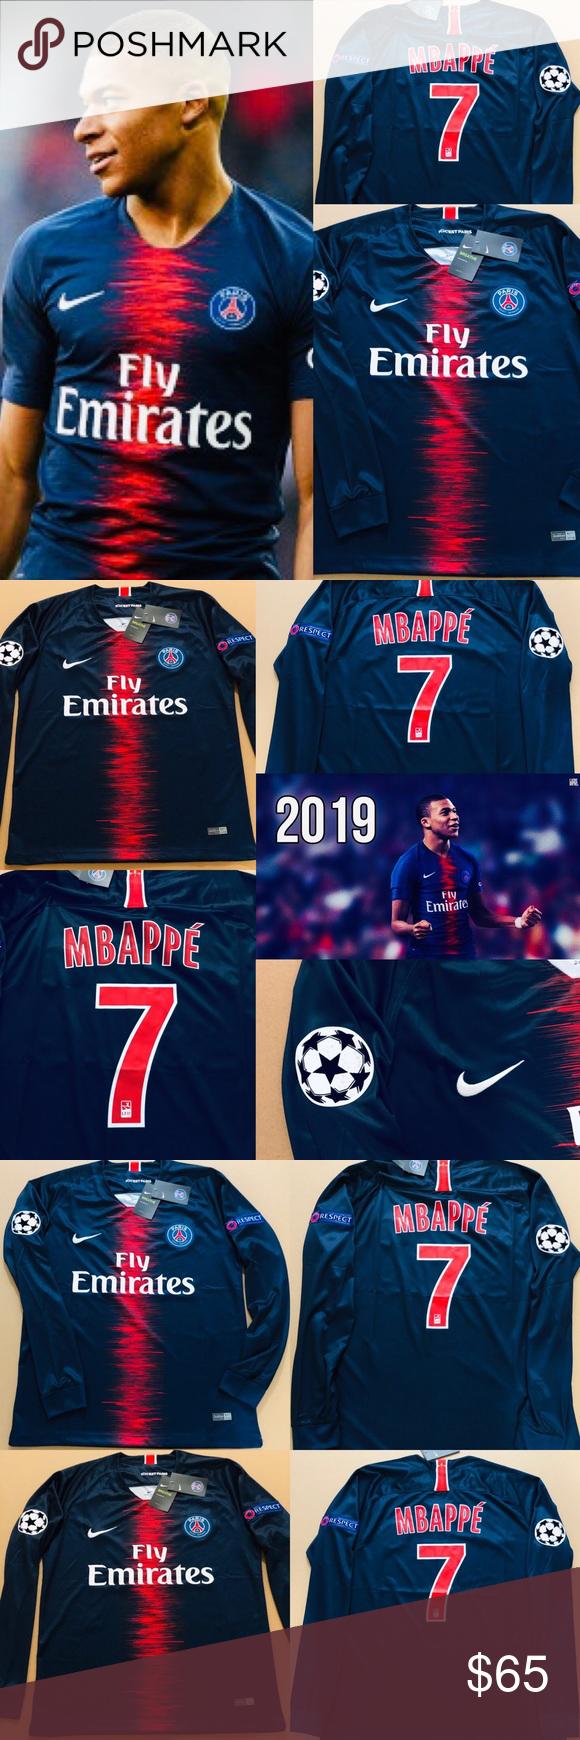 check out b5a12 3b3e5 Paris PSG Mbappe #7 Soccer Jersey Long Sleeve UEFA 2019 PSG ...